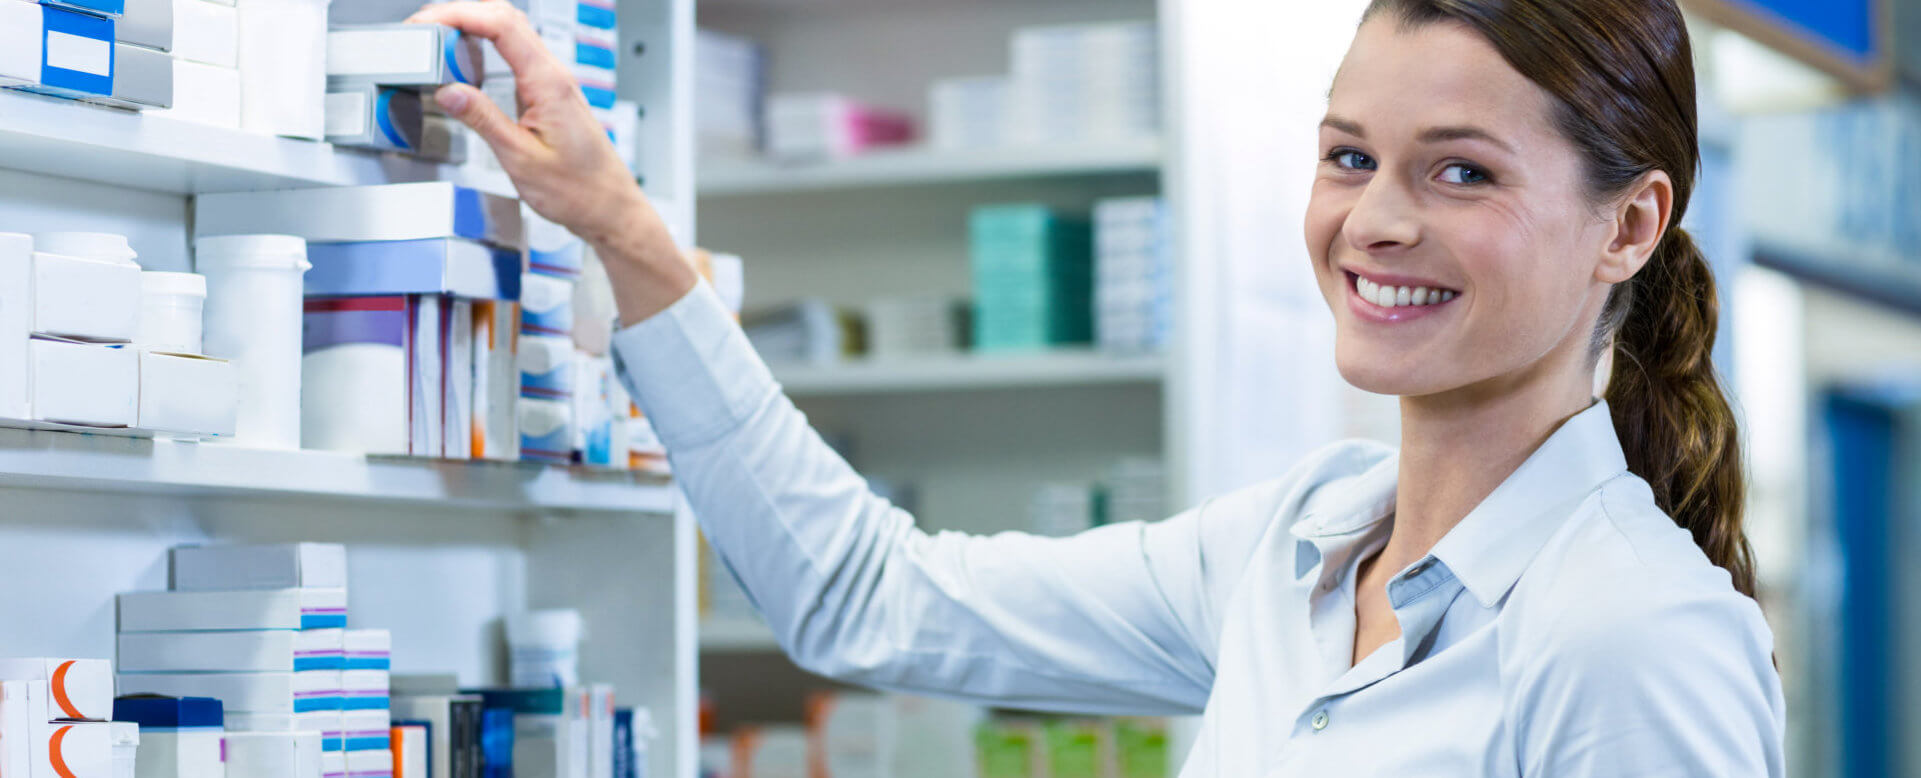 woman holding box of medicine